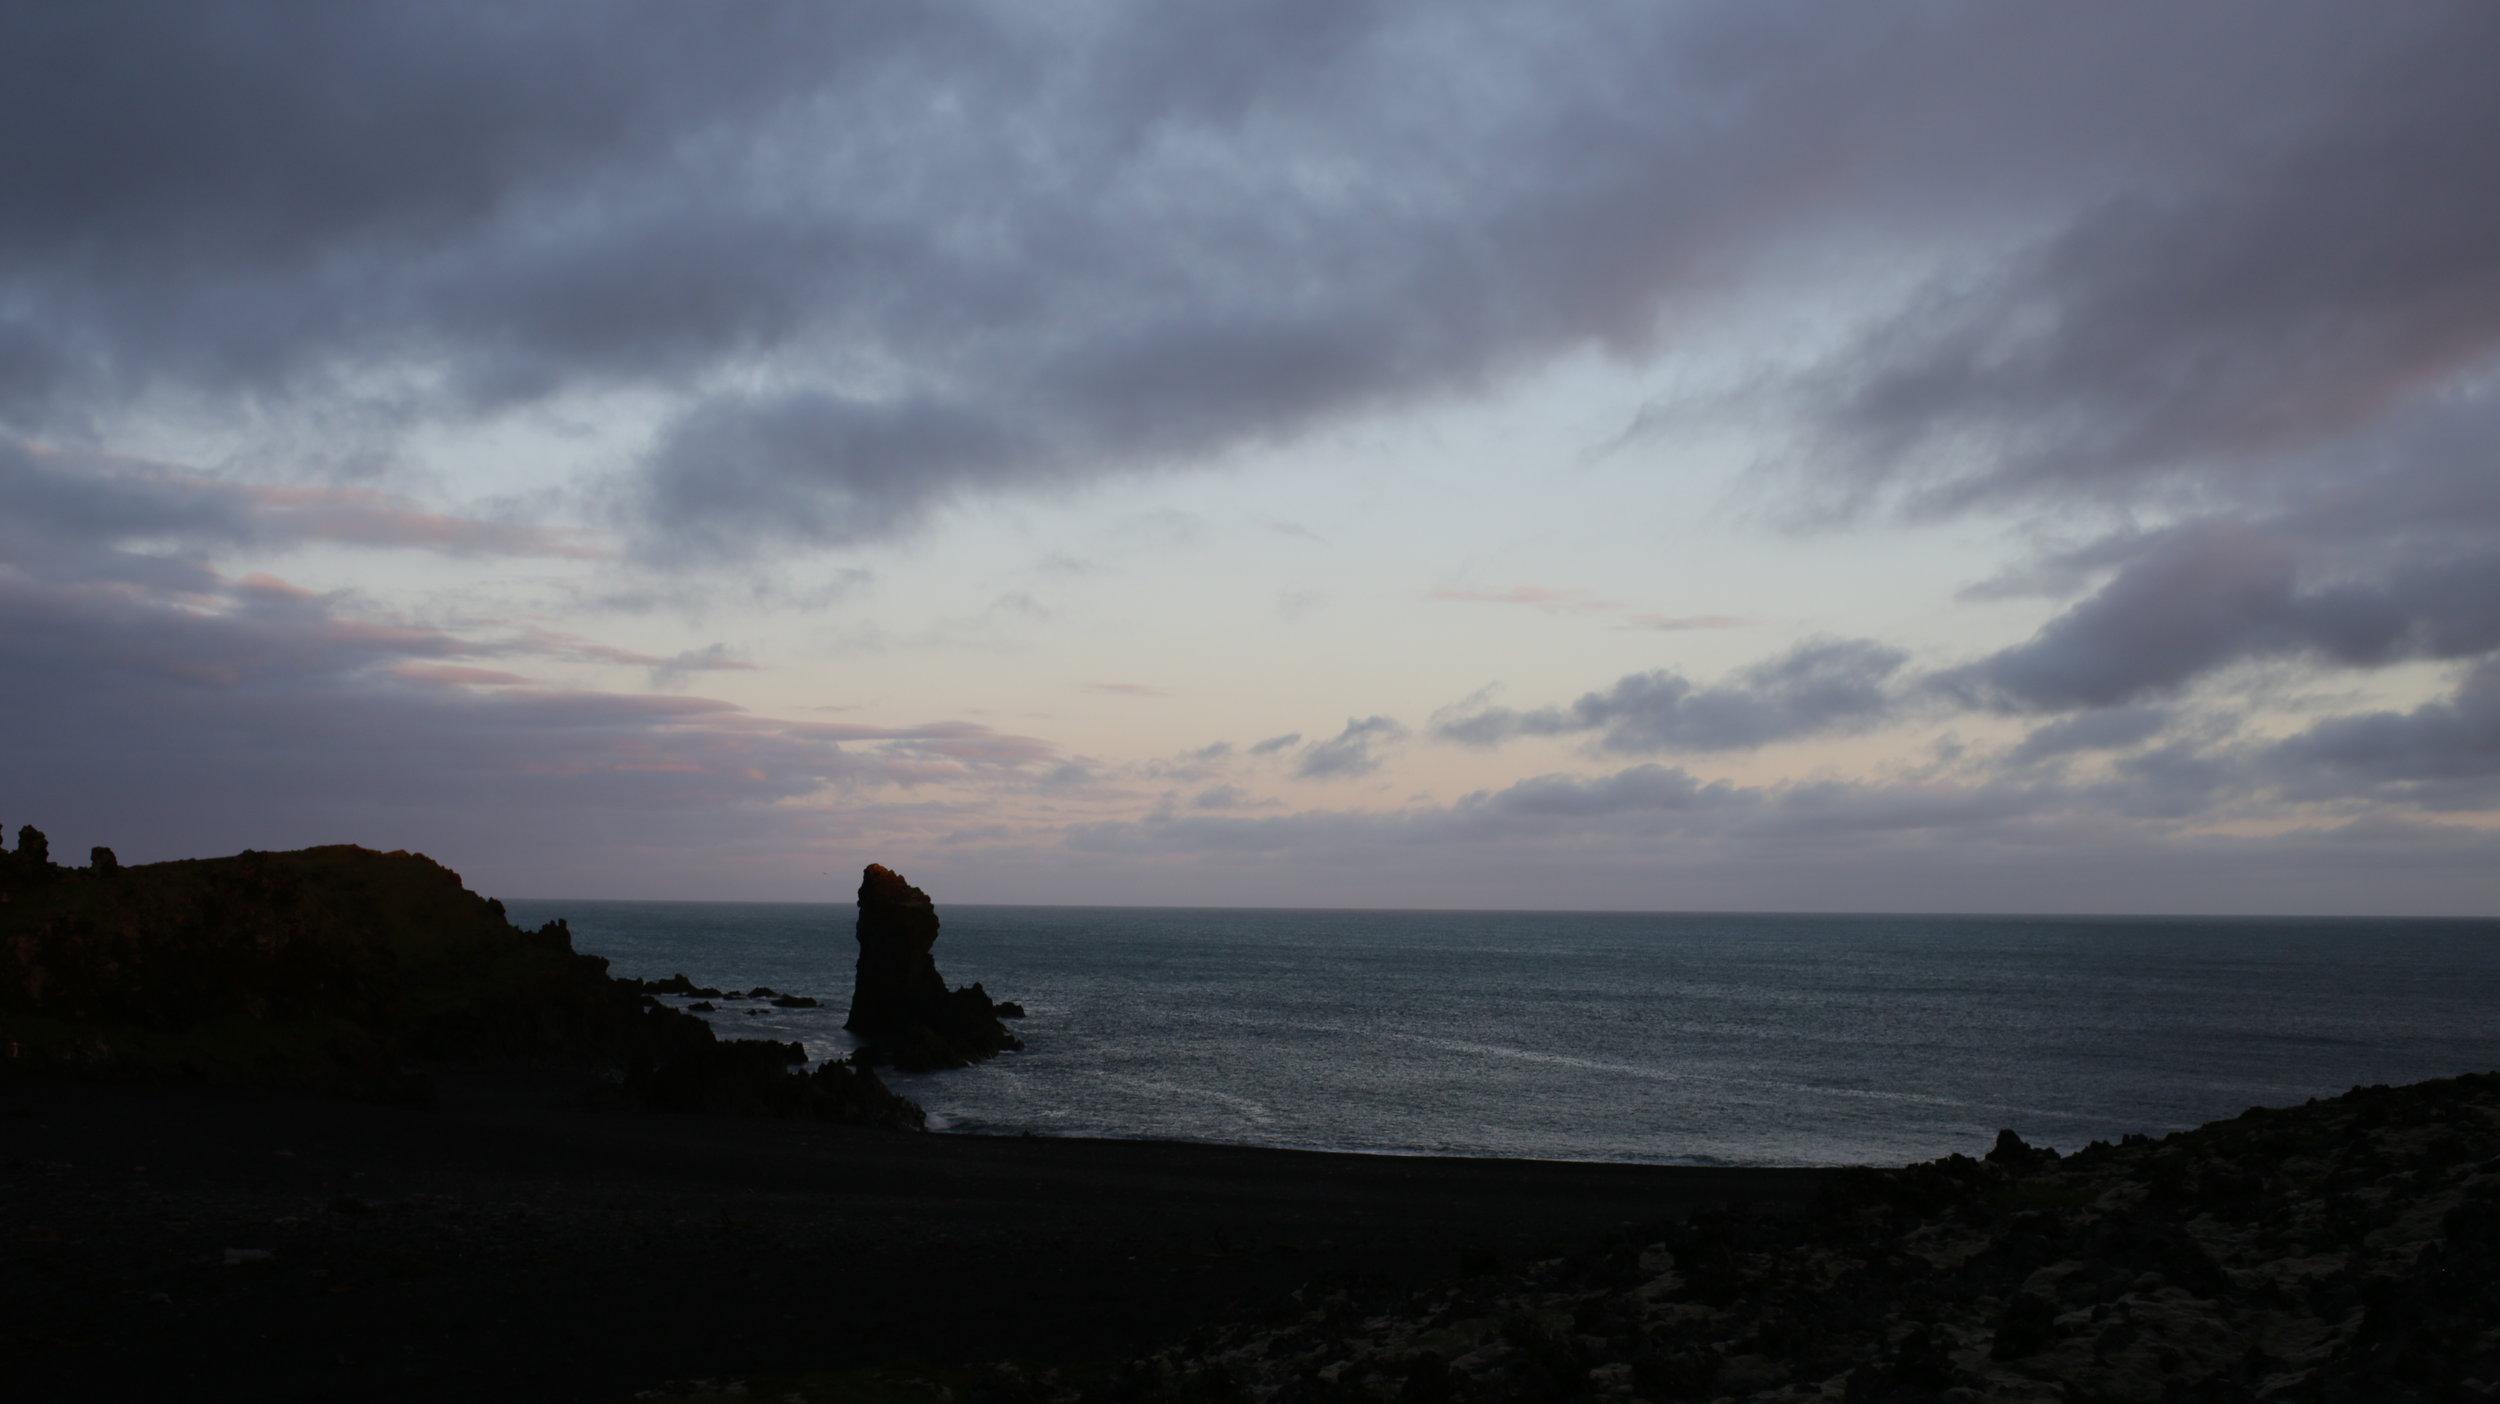 landscape ocean2_9543.JPG